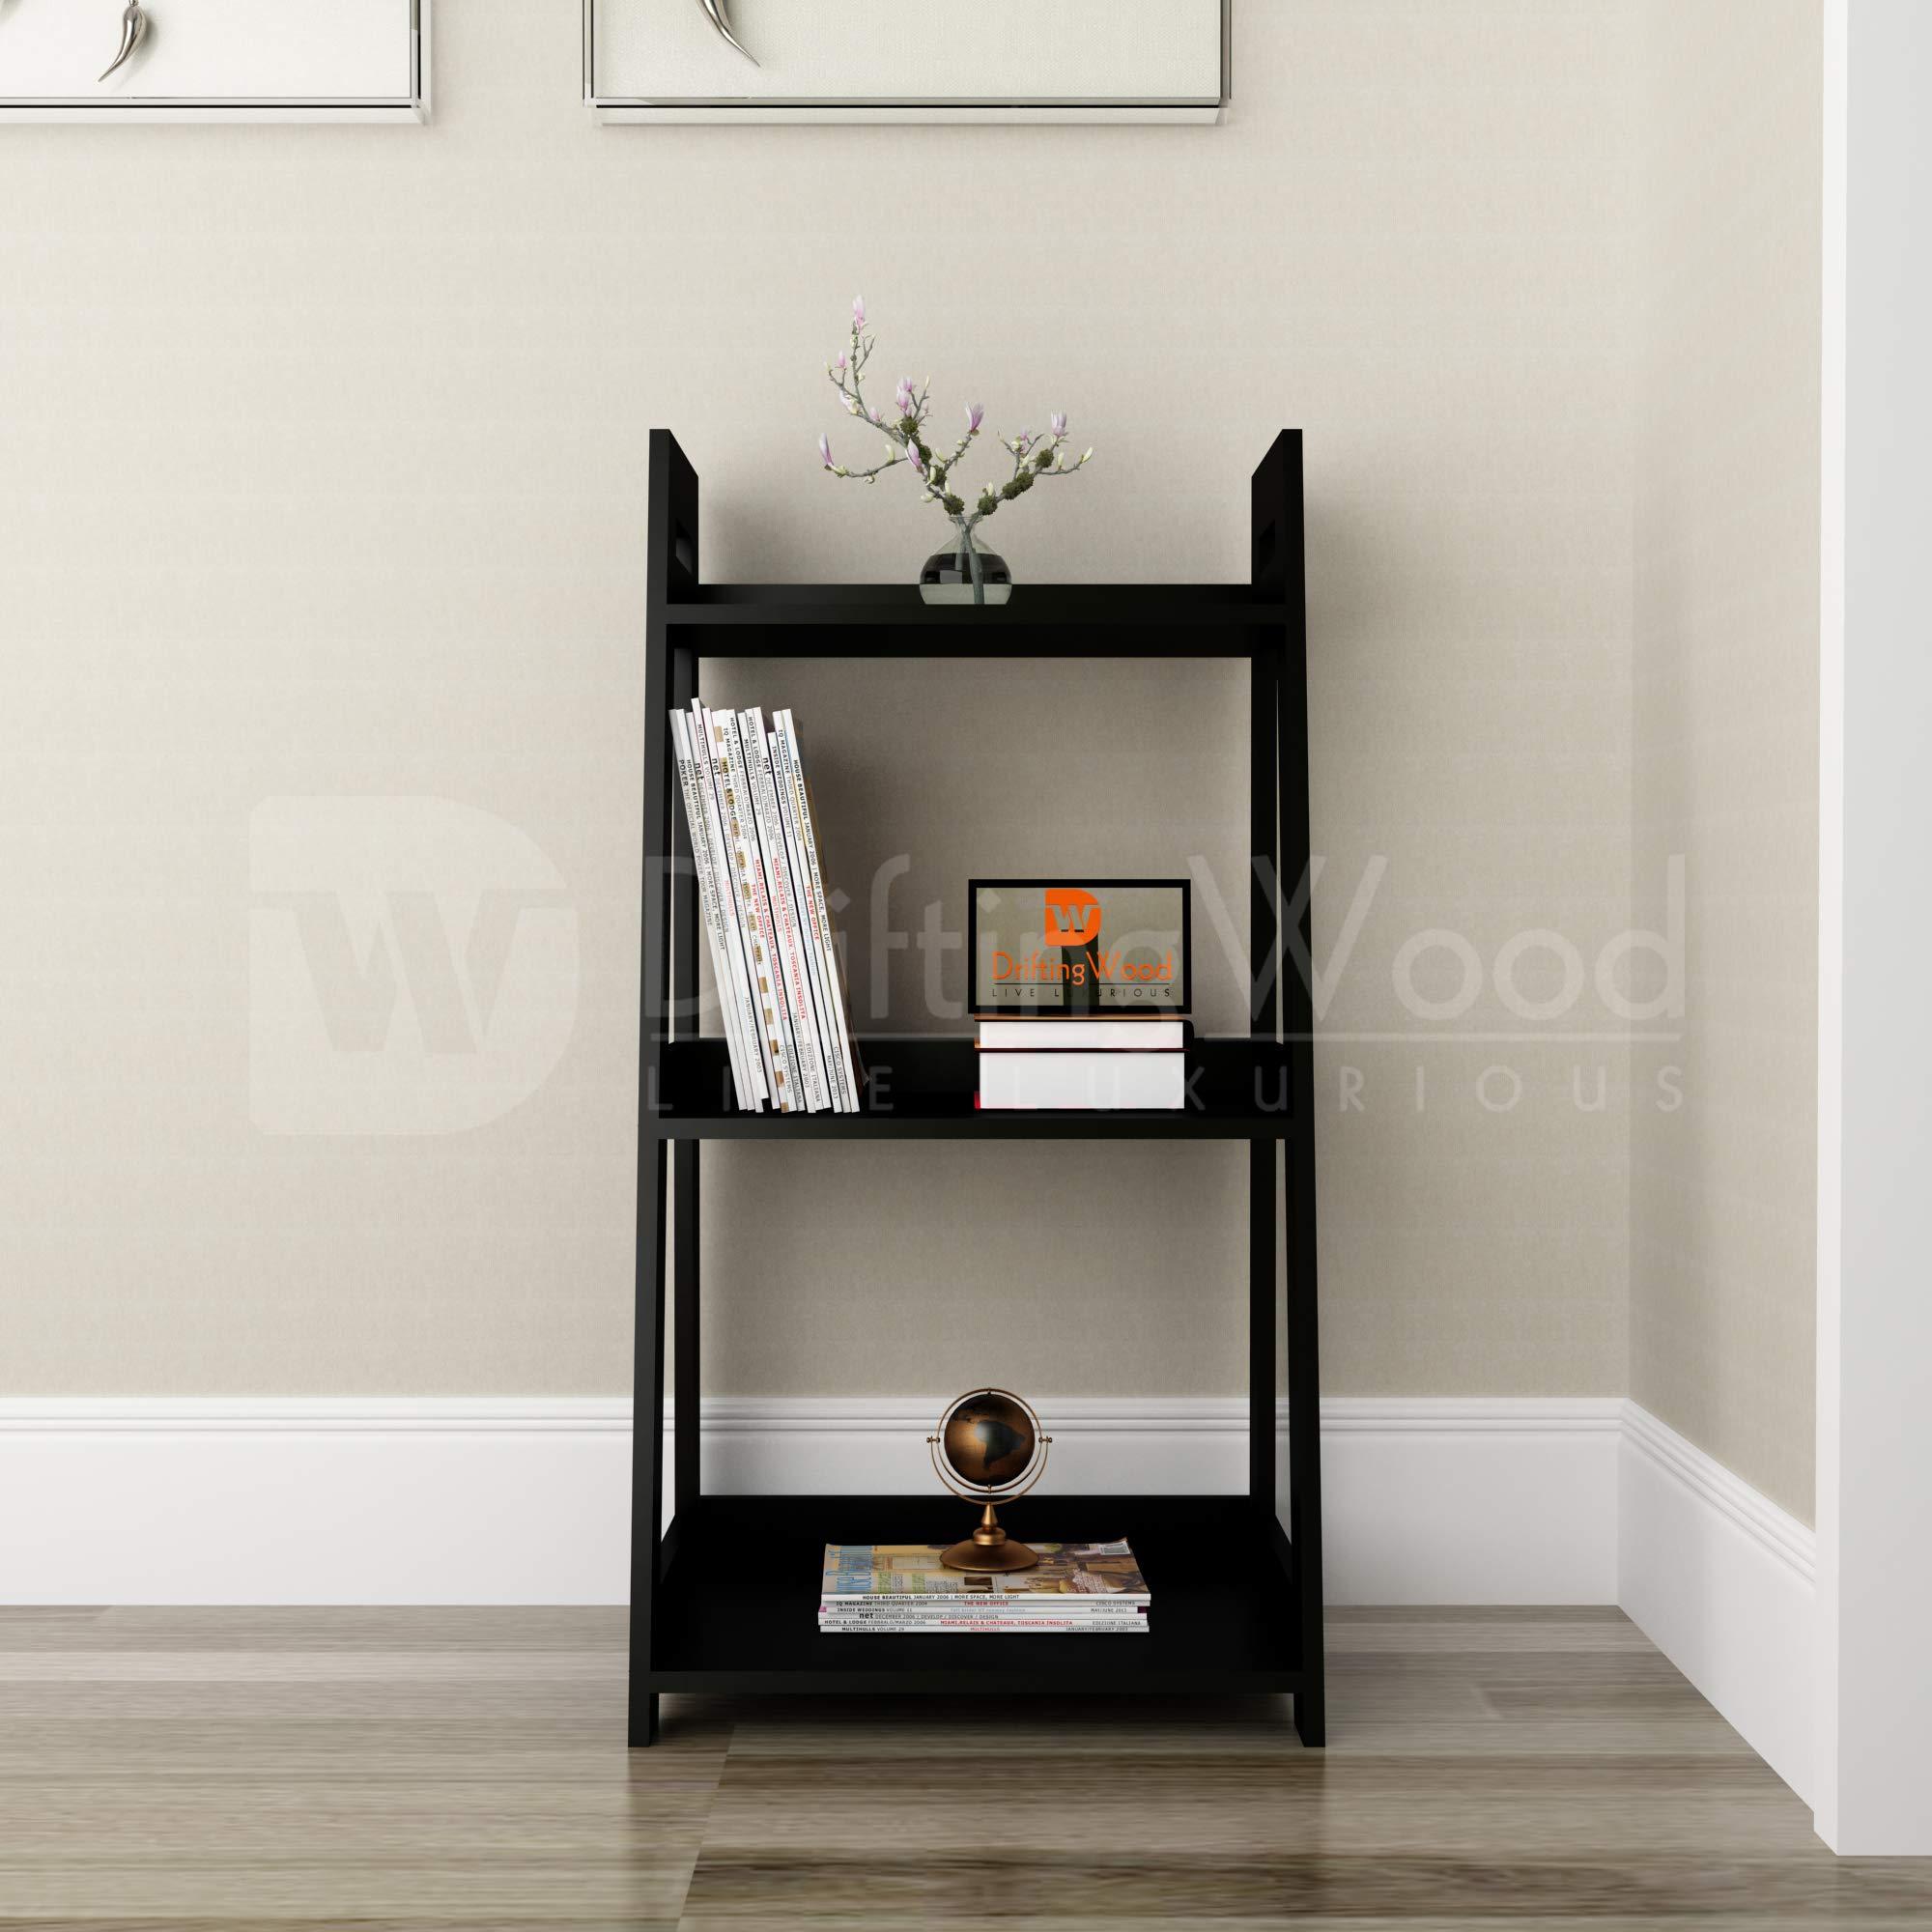 DriftingWood Wooden Furniture 3 Tier Ladder Shelf & Room Organizer Storage  Divider Furniture